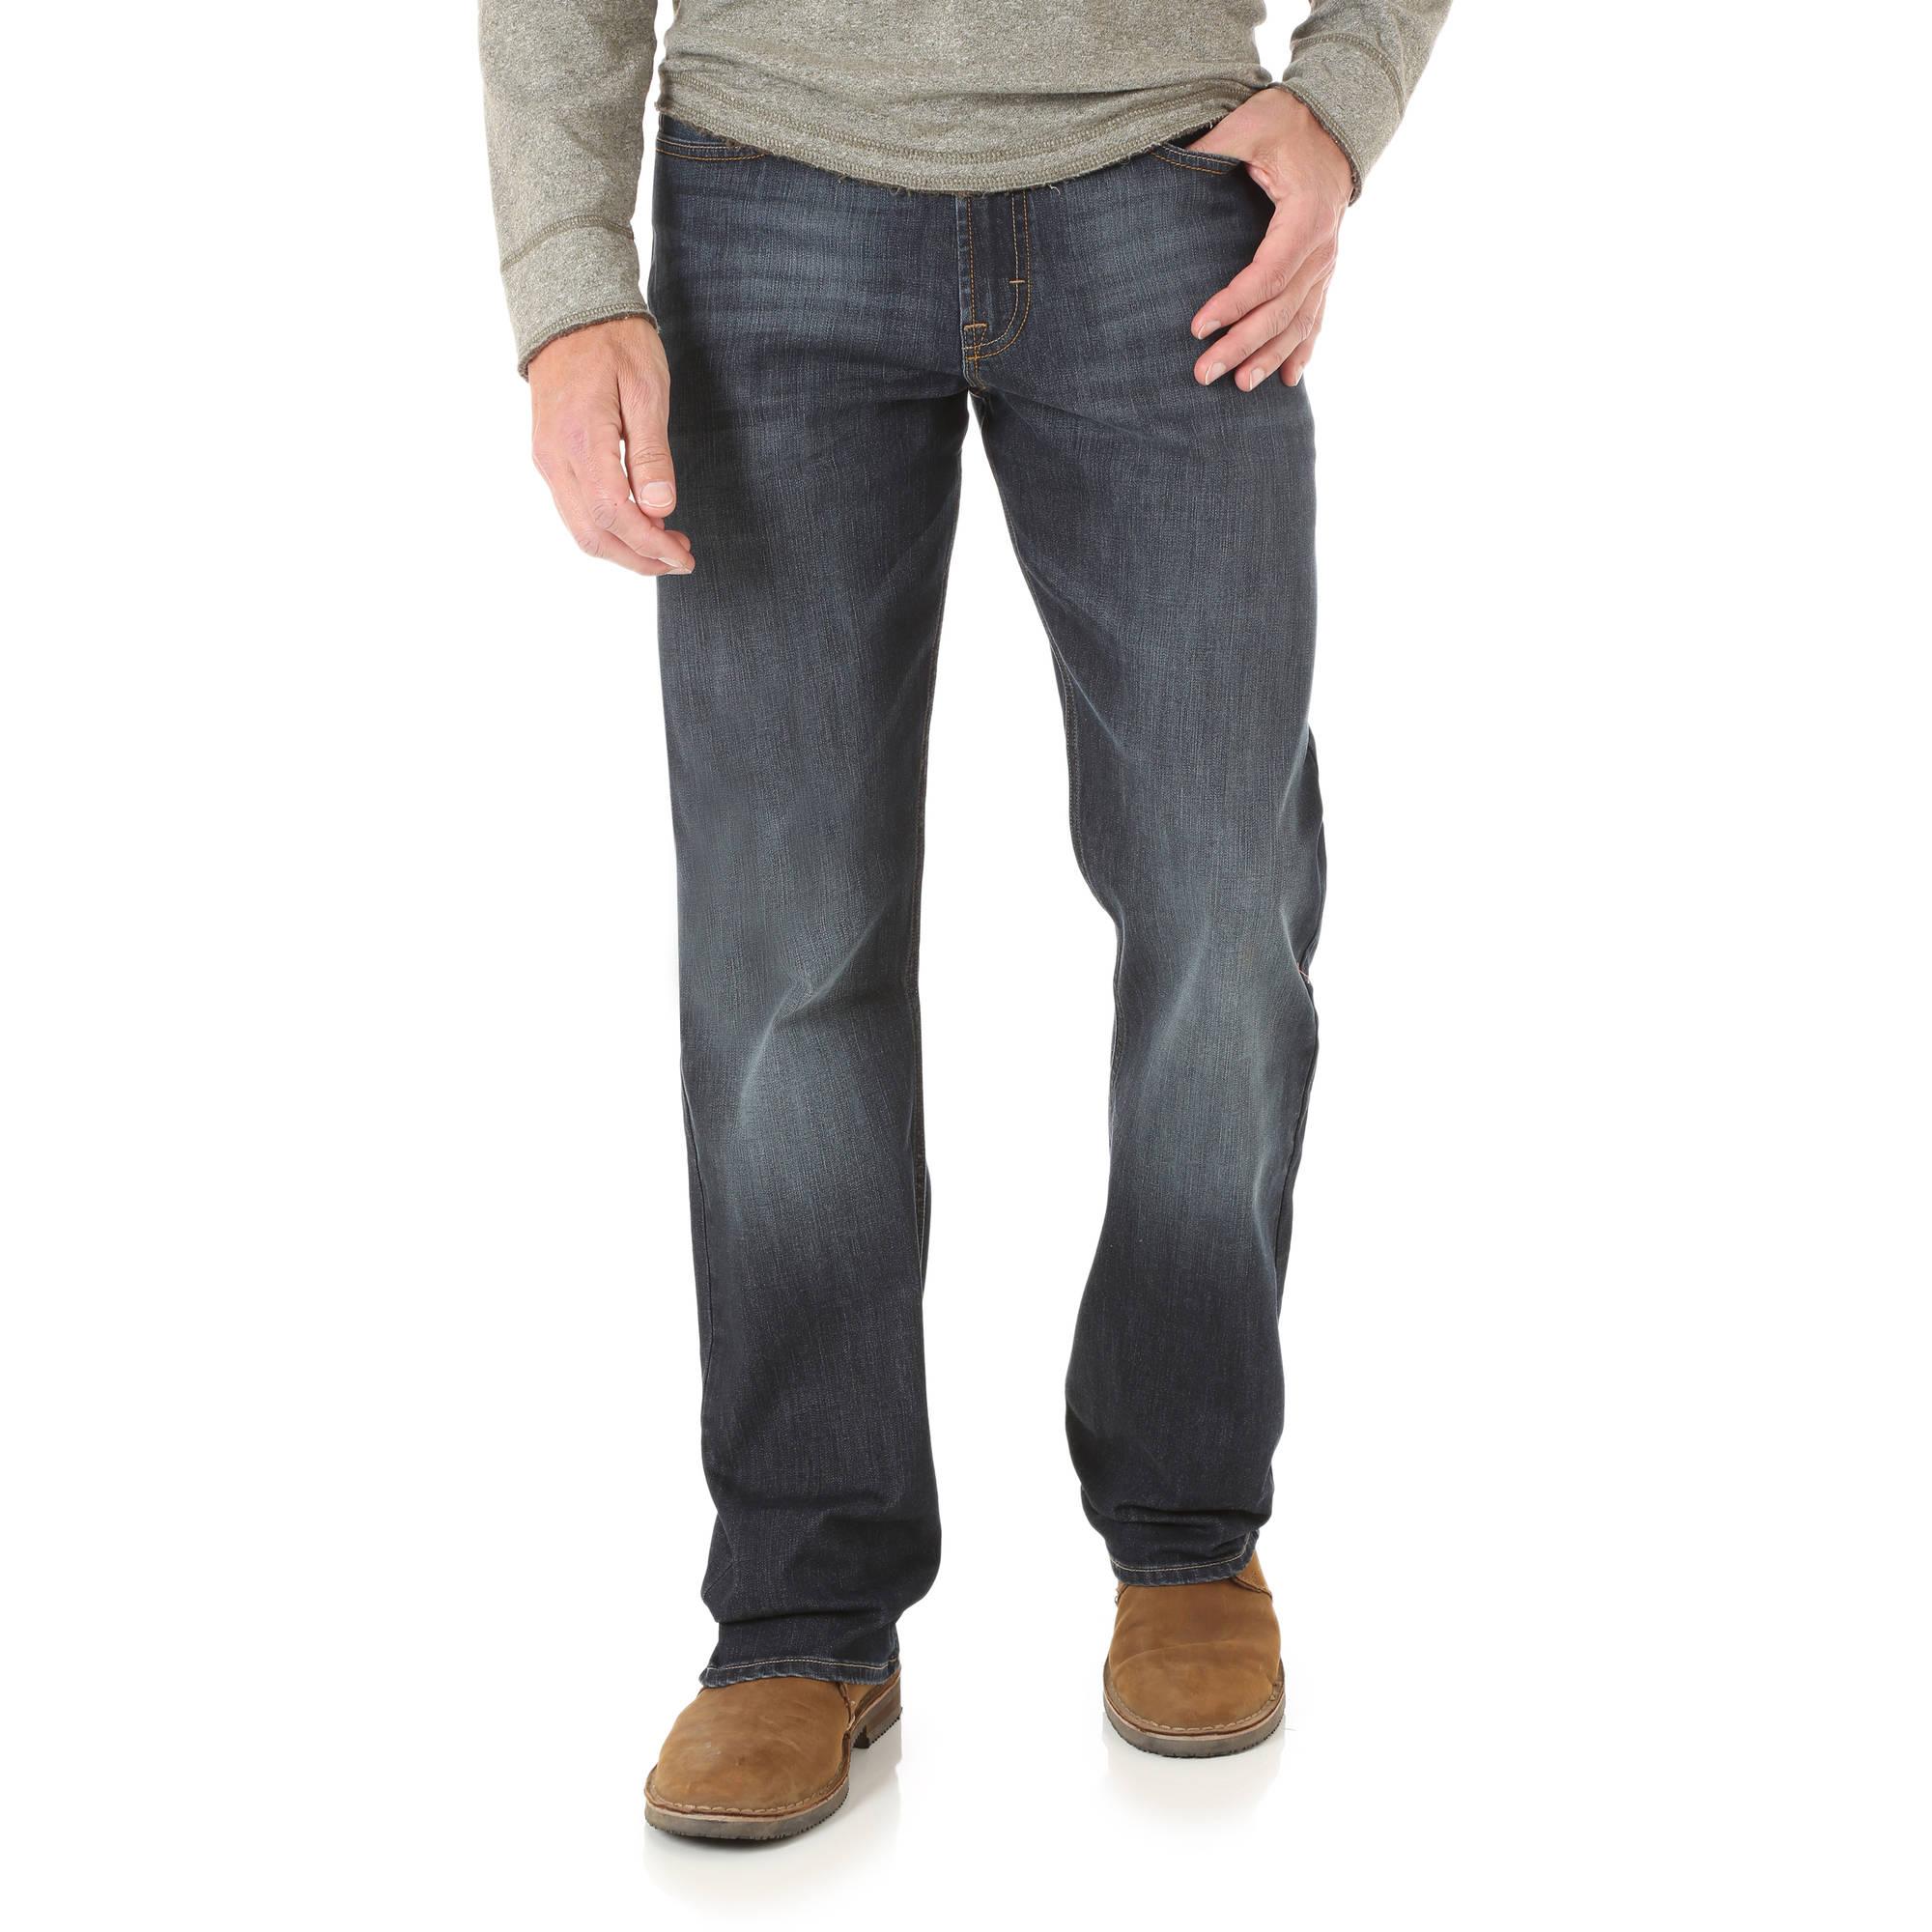 Wrangler Jeans Co. Men's Relaxed Bootcut Jean - Walmart.com